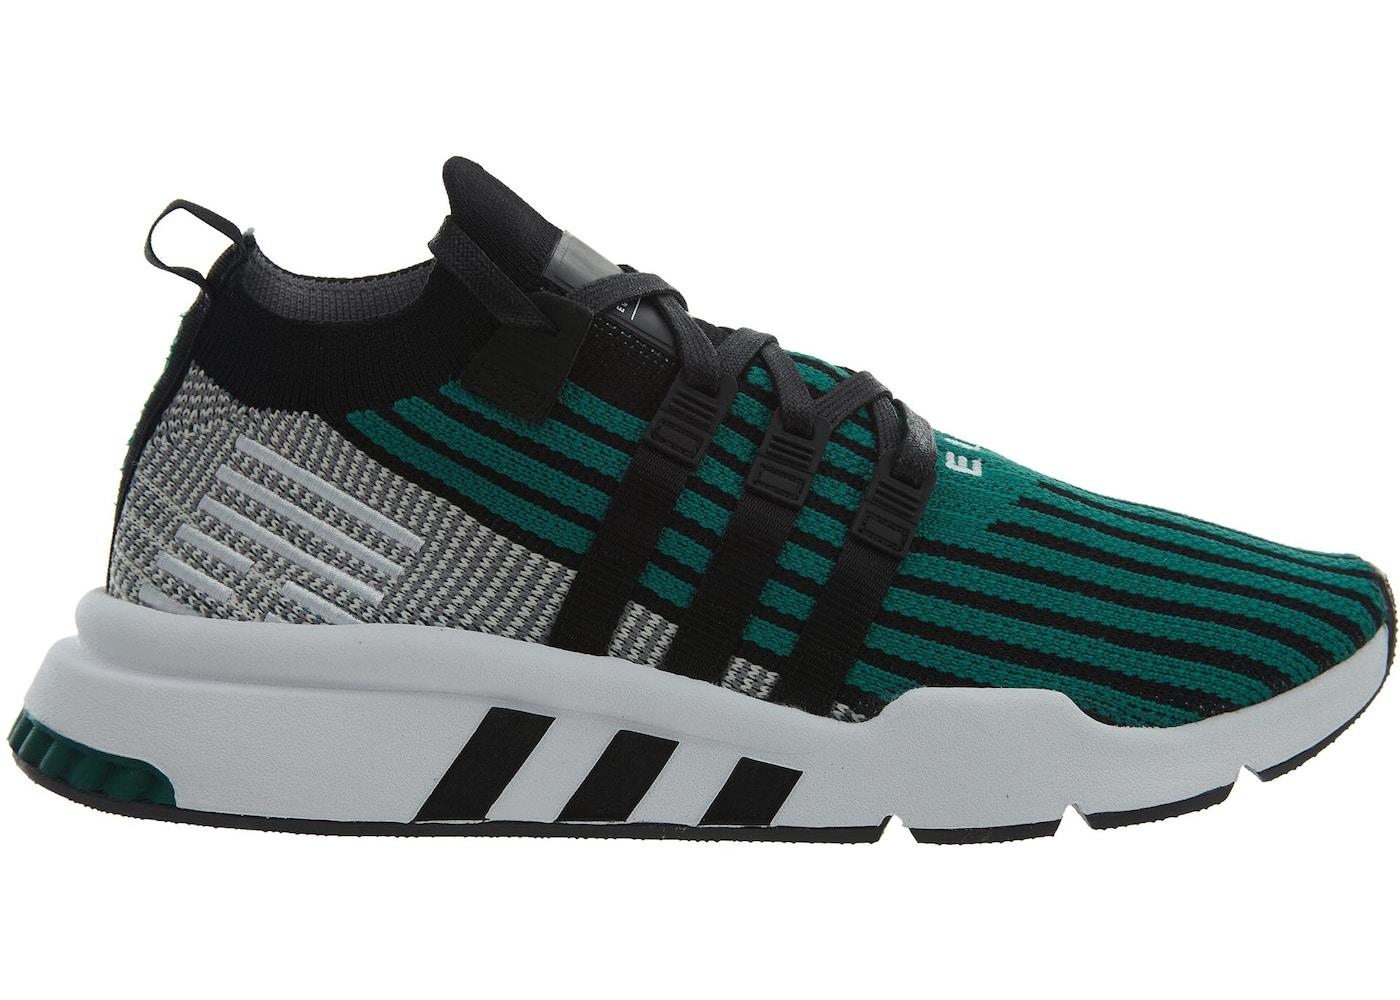 official photos 7ad78 0306c adidas Eqt Support Mid Adv Pk Black Black-Sub Green